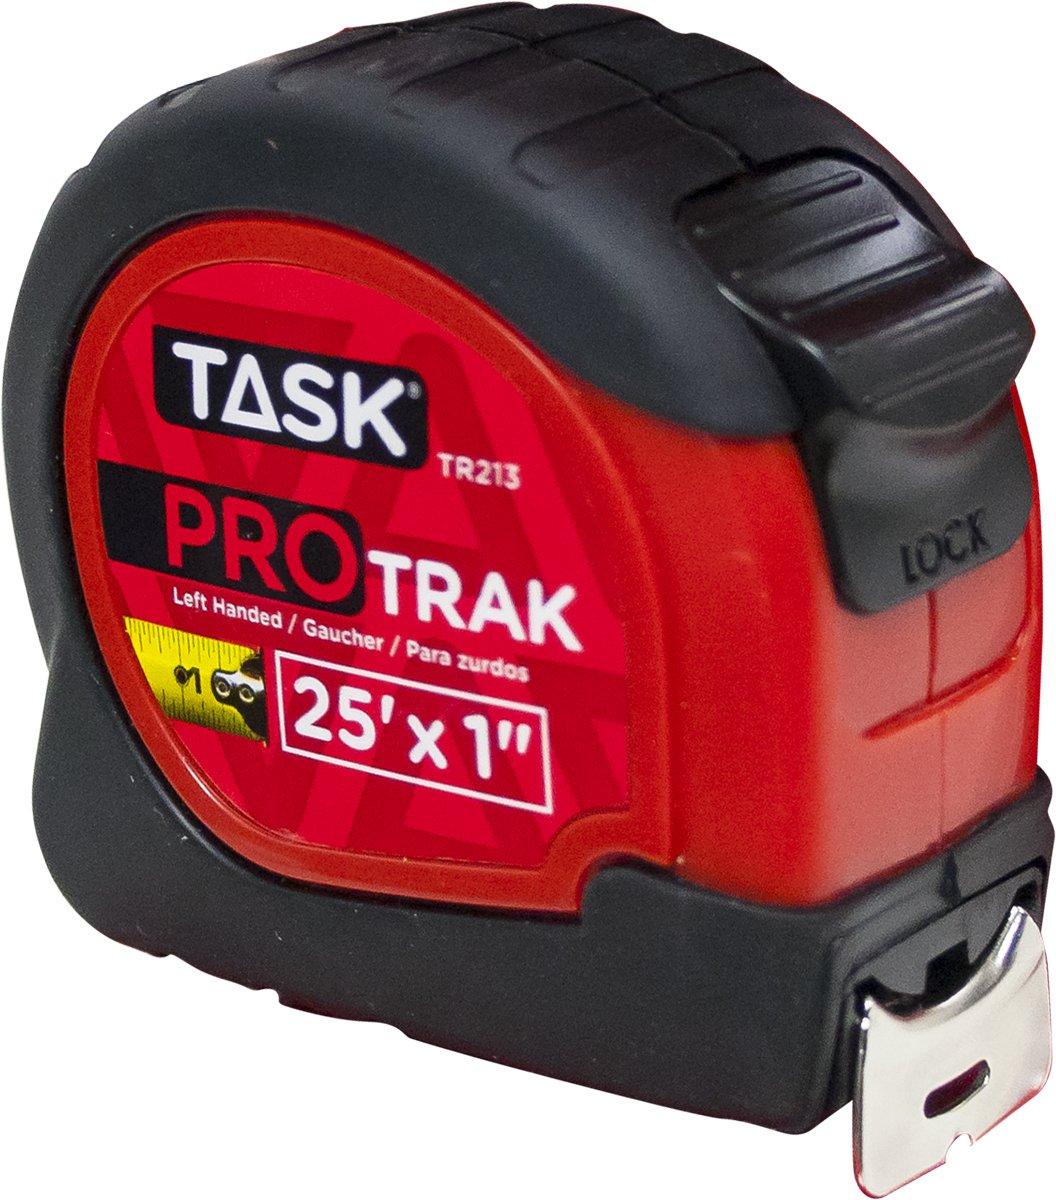 Task Tools TR213 25 Feet ProTrak Tape Measure Left Handed Red